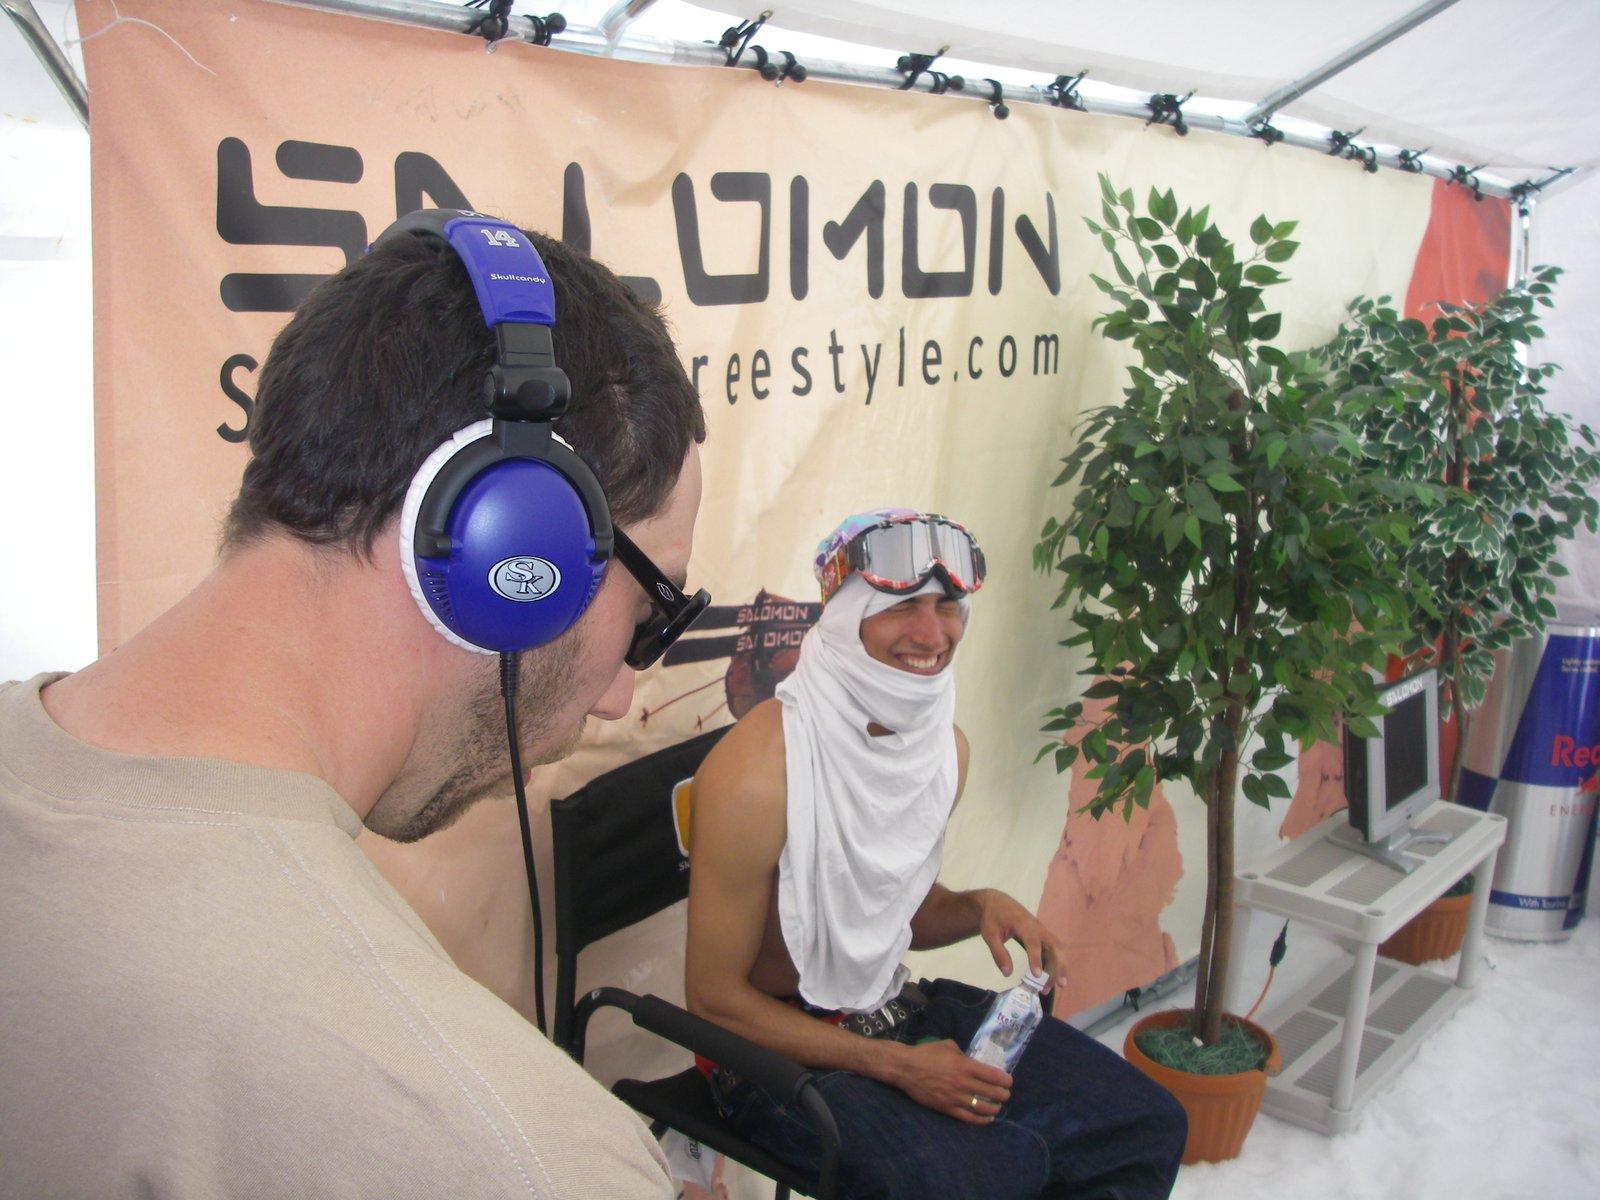 Dakota spinning breats for Cosco int eh Salomon Lounge